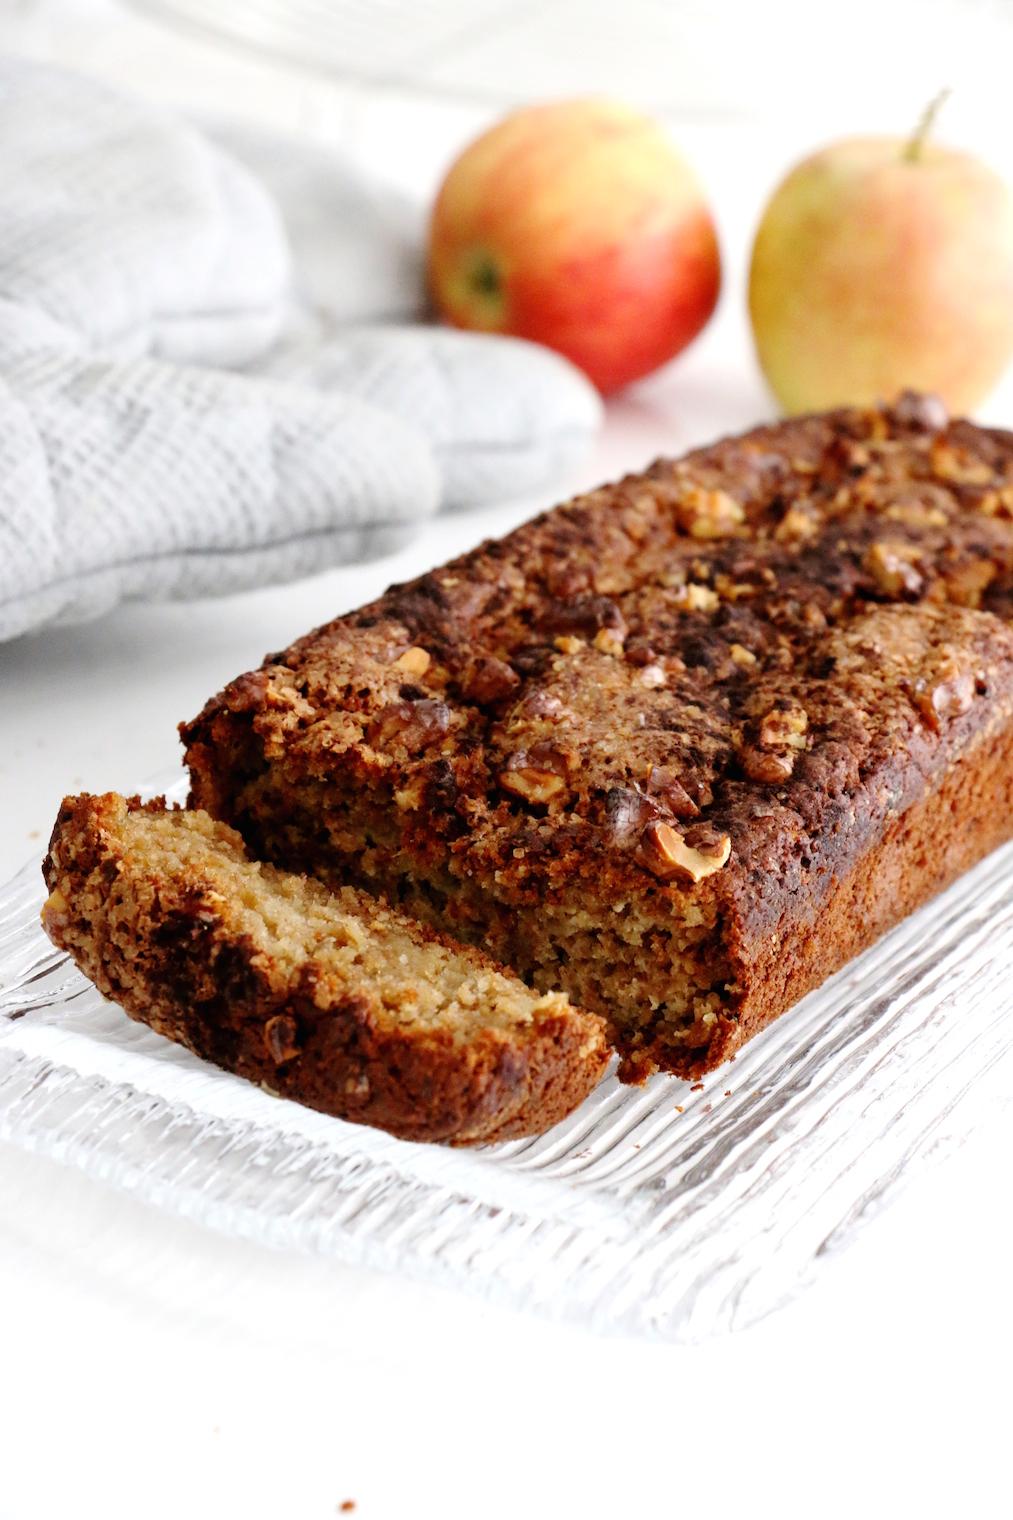 healthier apple cinnamon bread | www.savormania.com